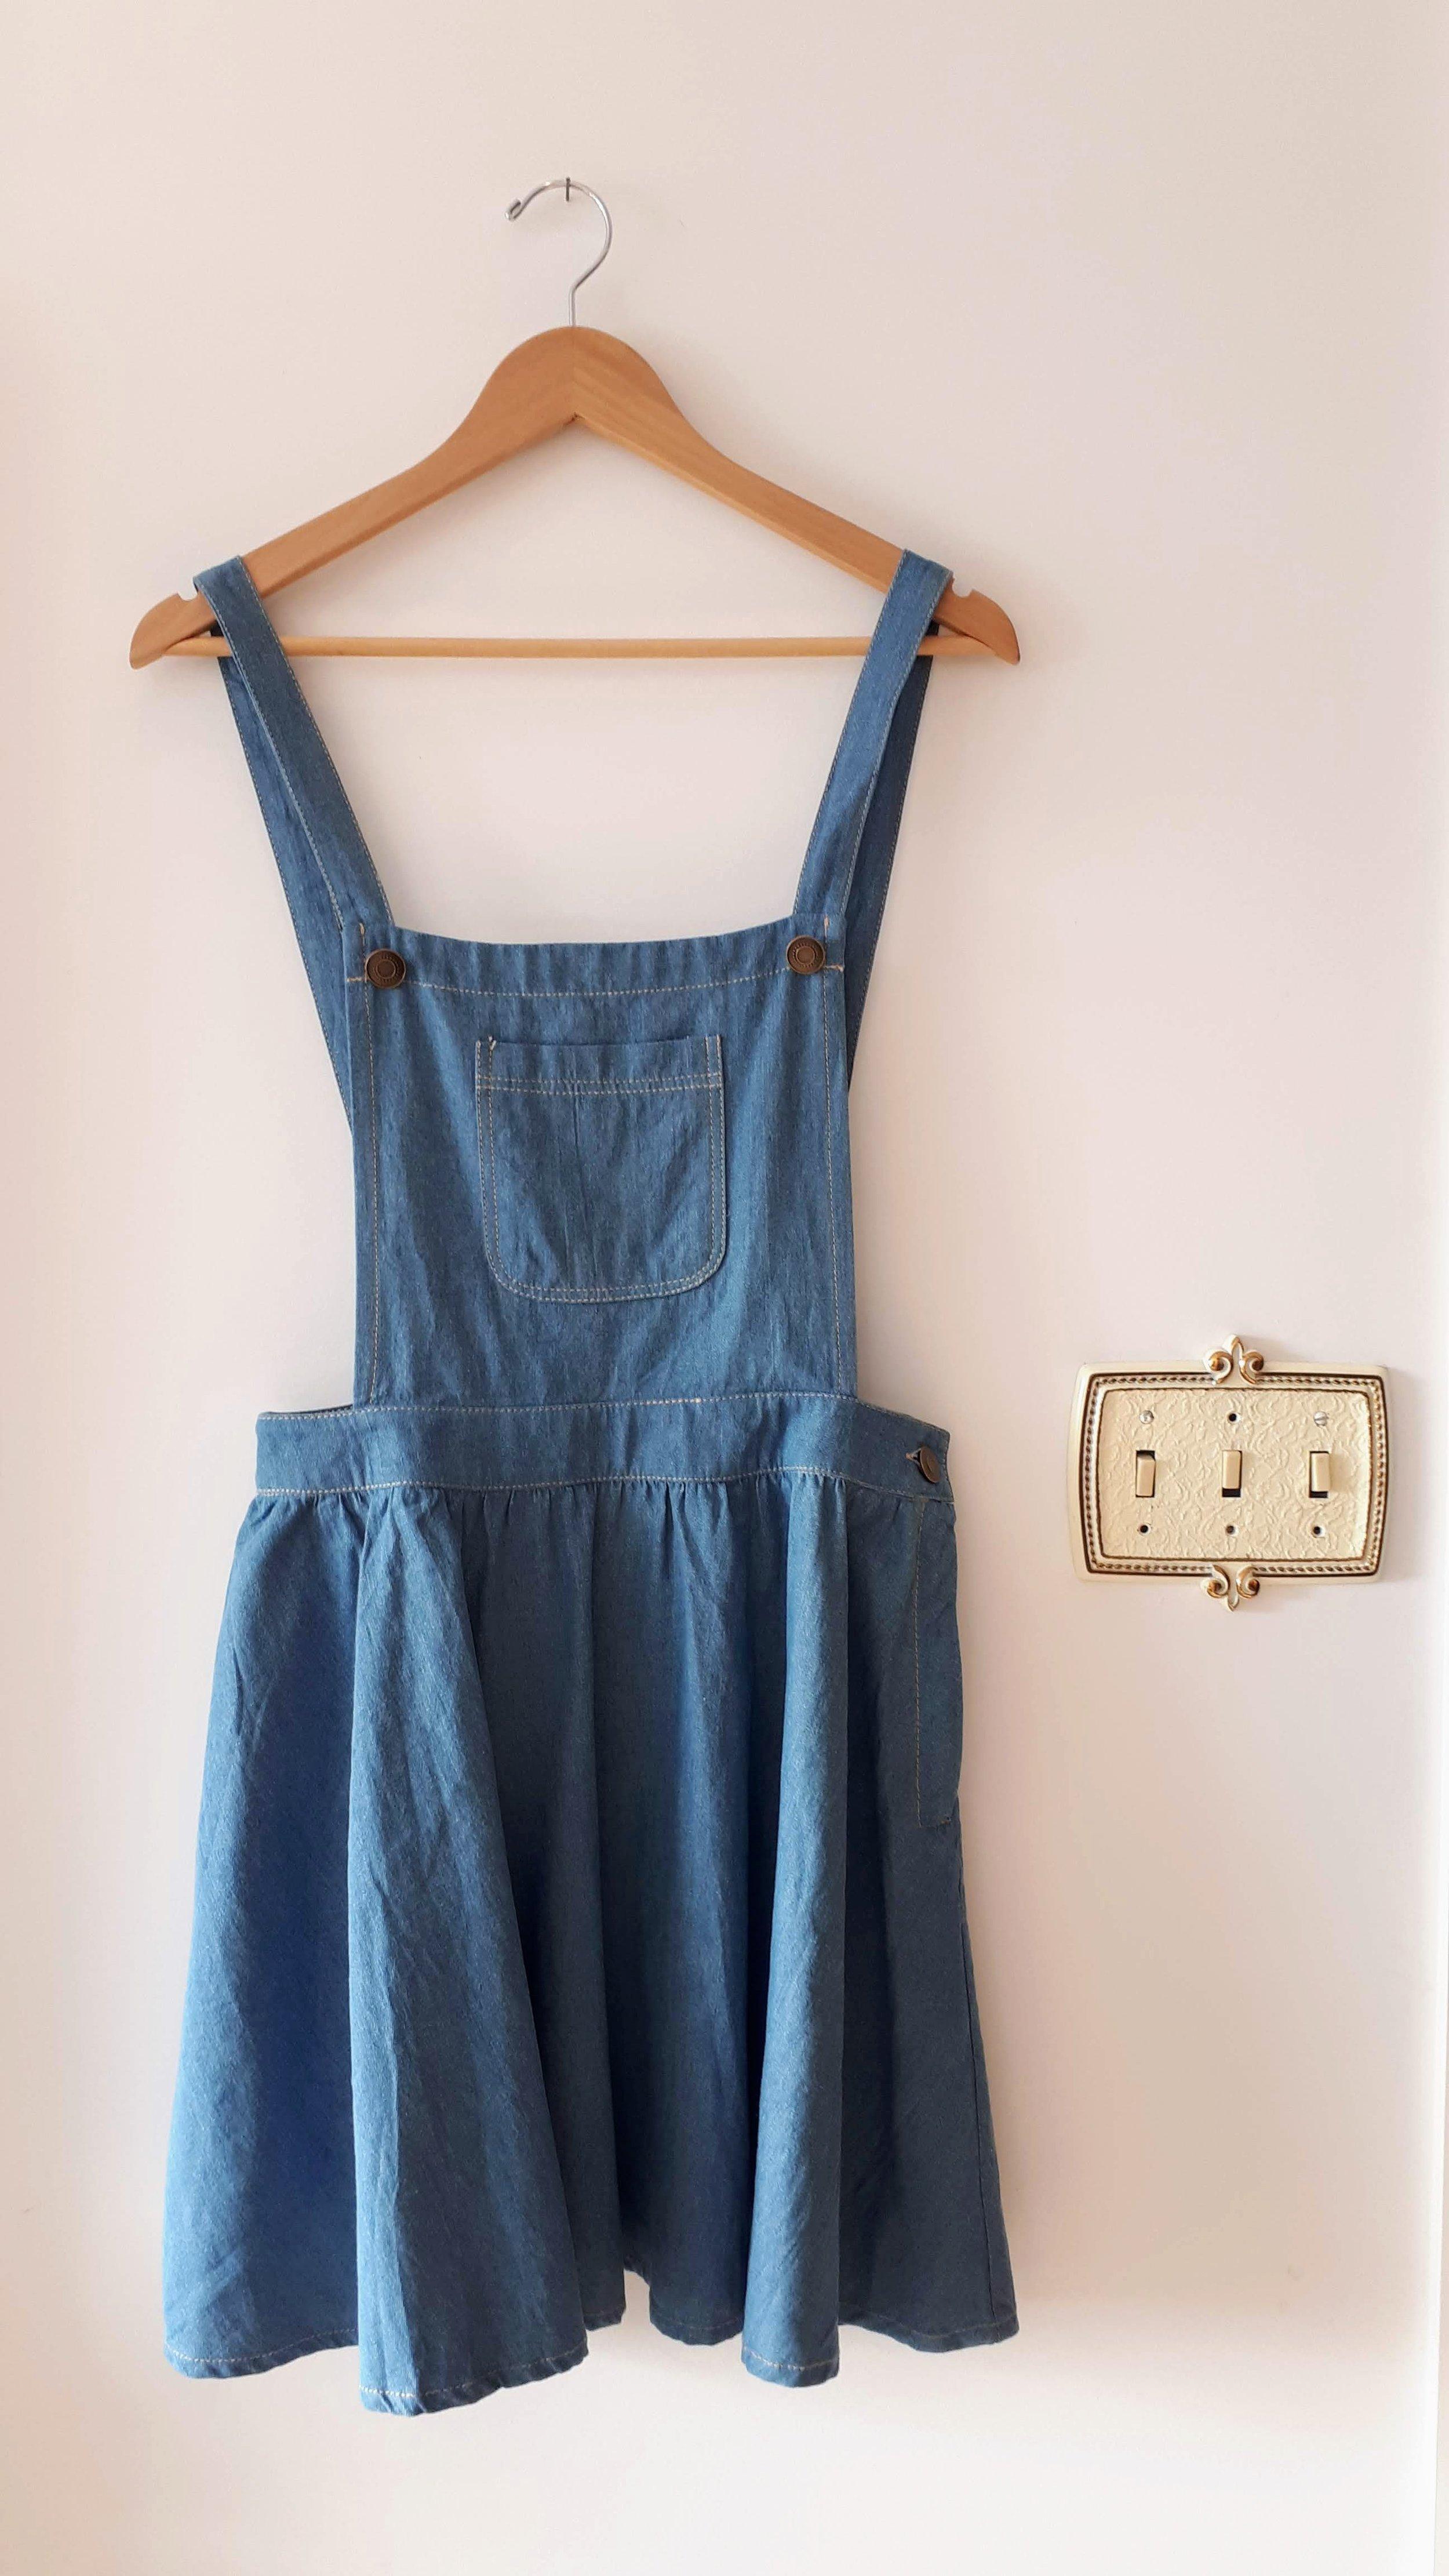 Moon dress; Size M, $30